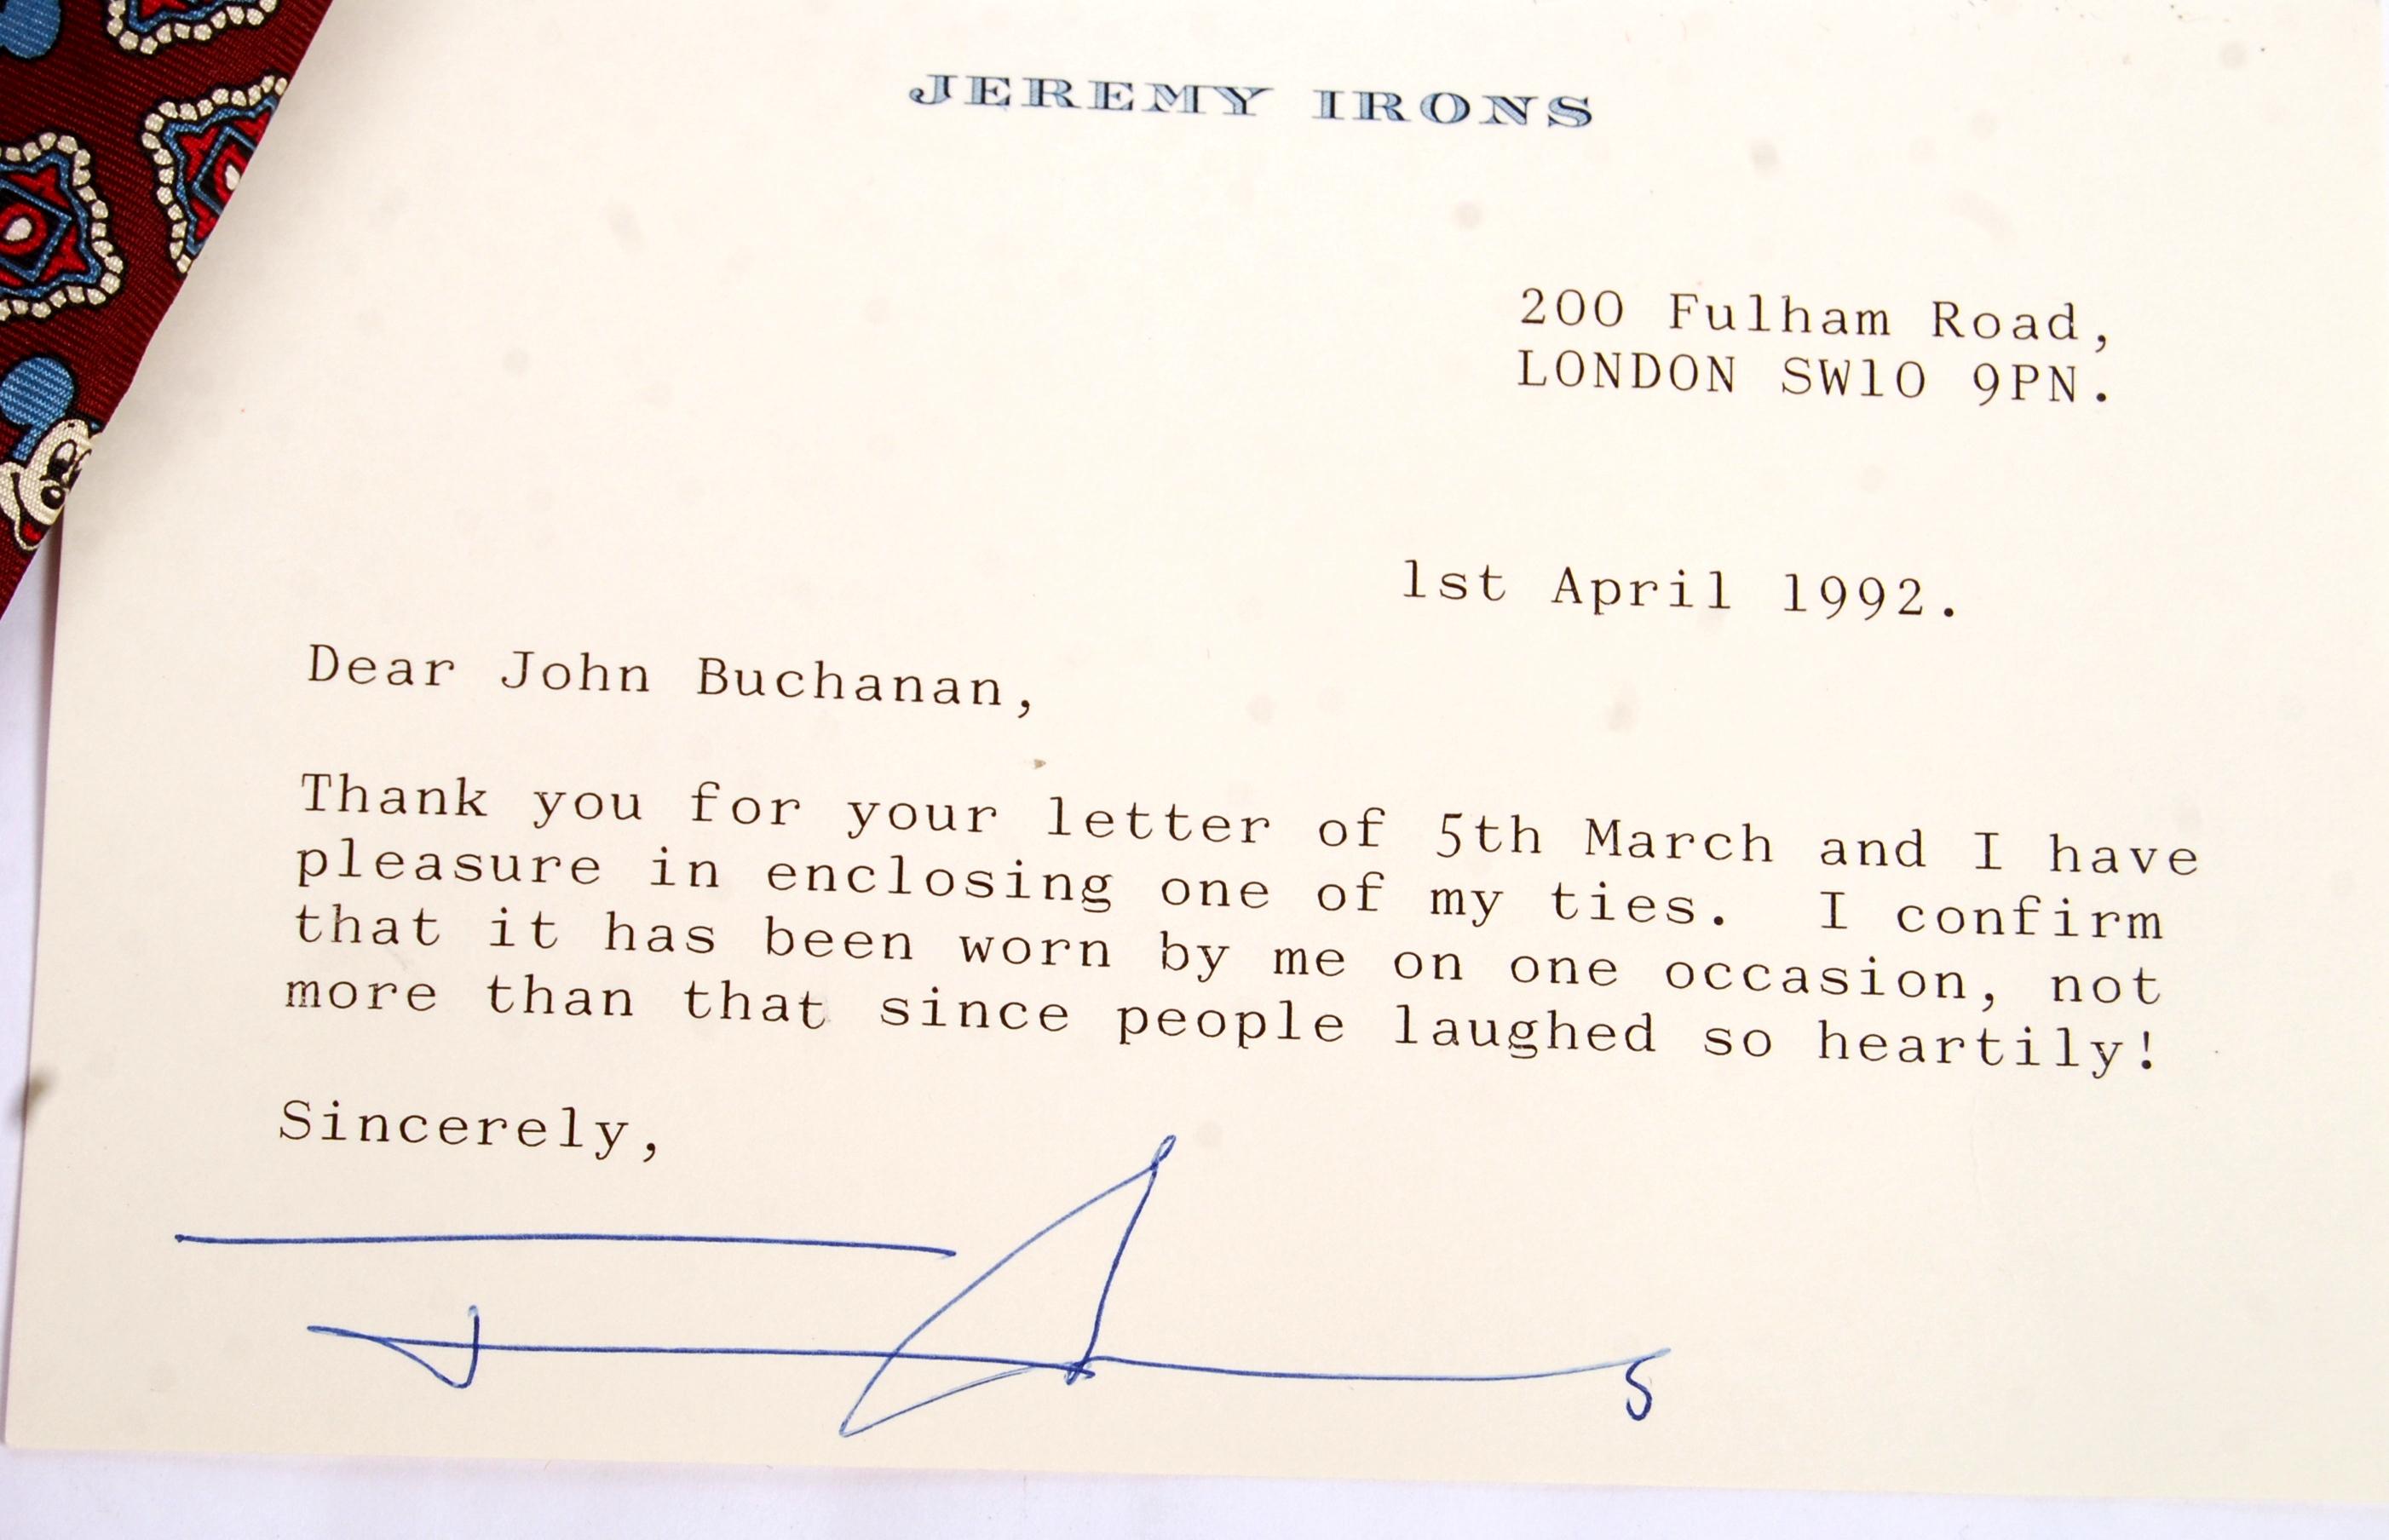 Lot 131 - JEREMY IRONS - ENGLISH ACTOR - DIE HARD II - WORN